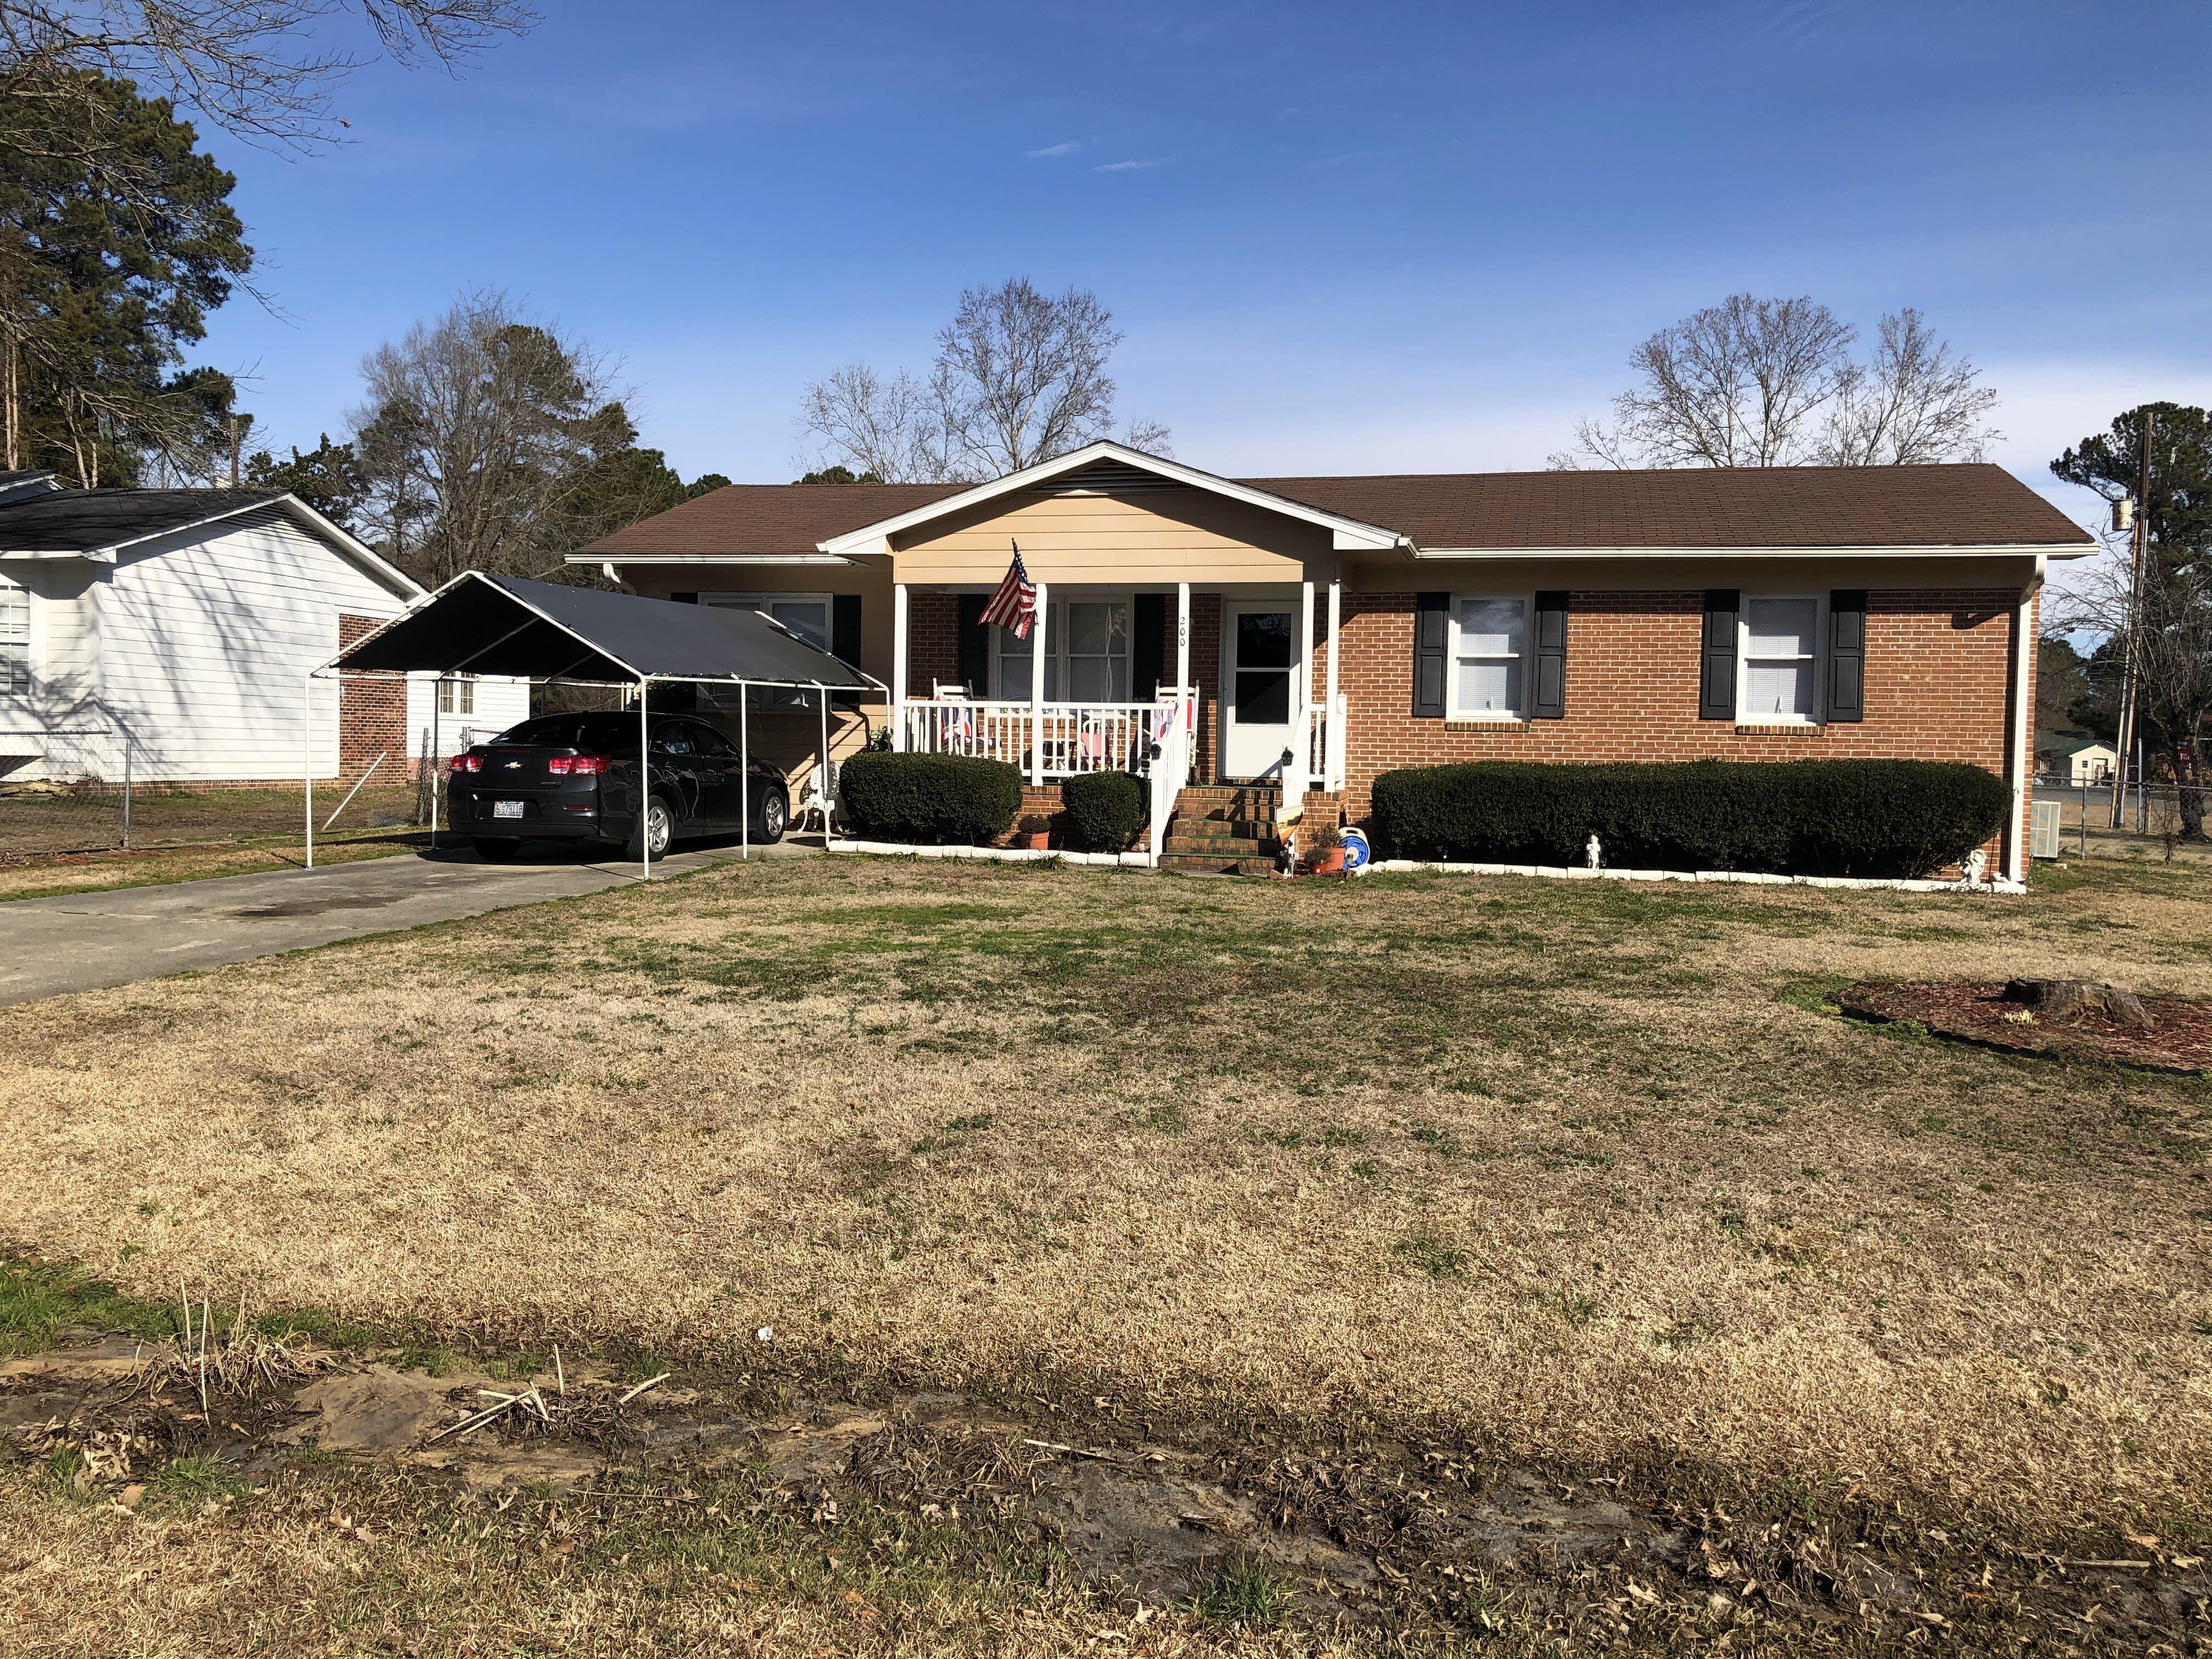 200 Old Farm Rd, Smithfield, NC